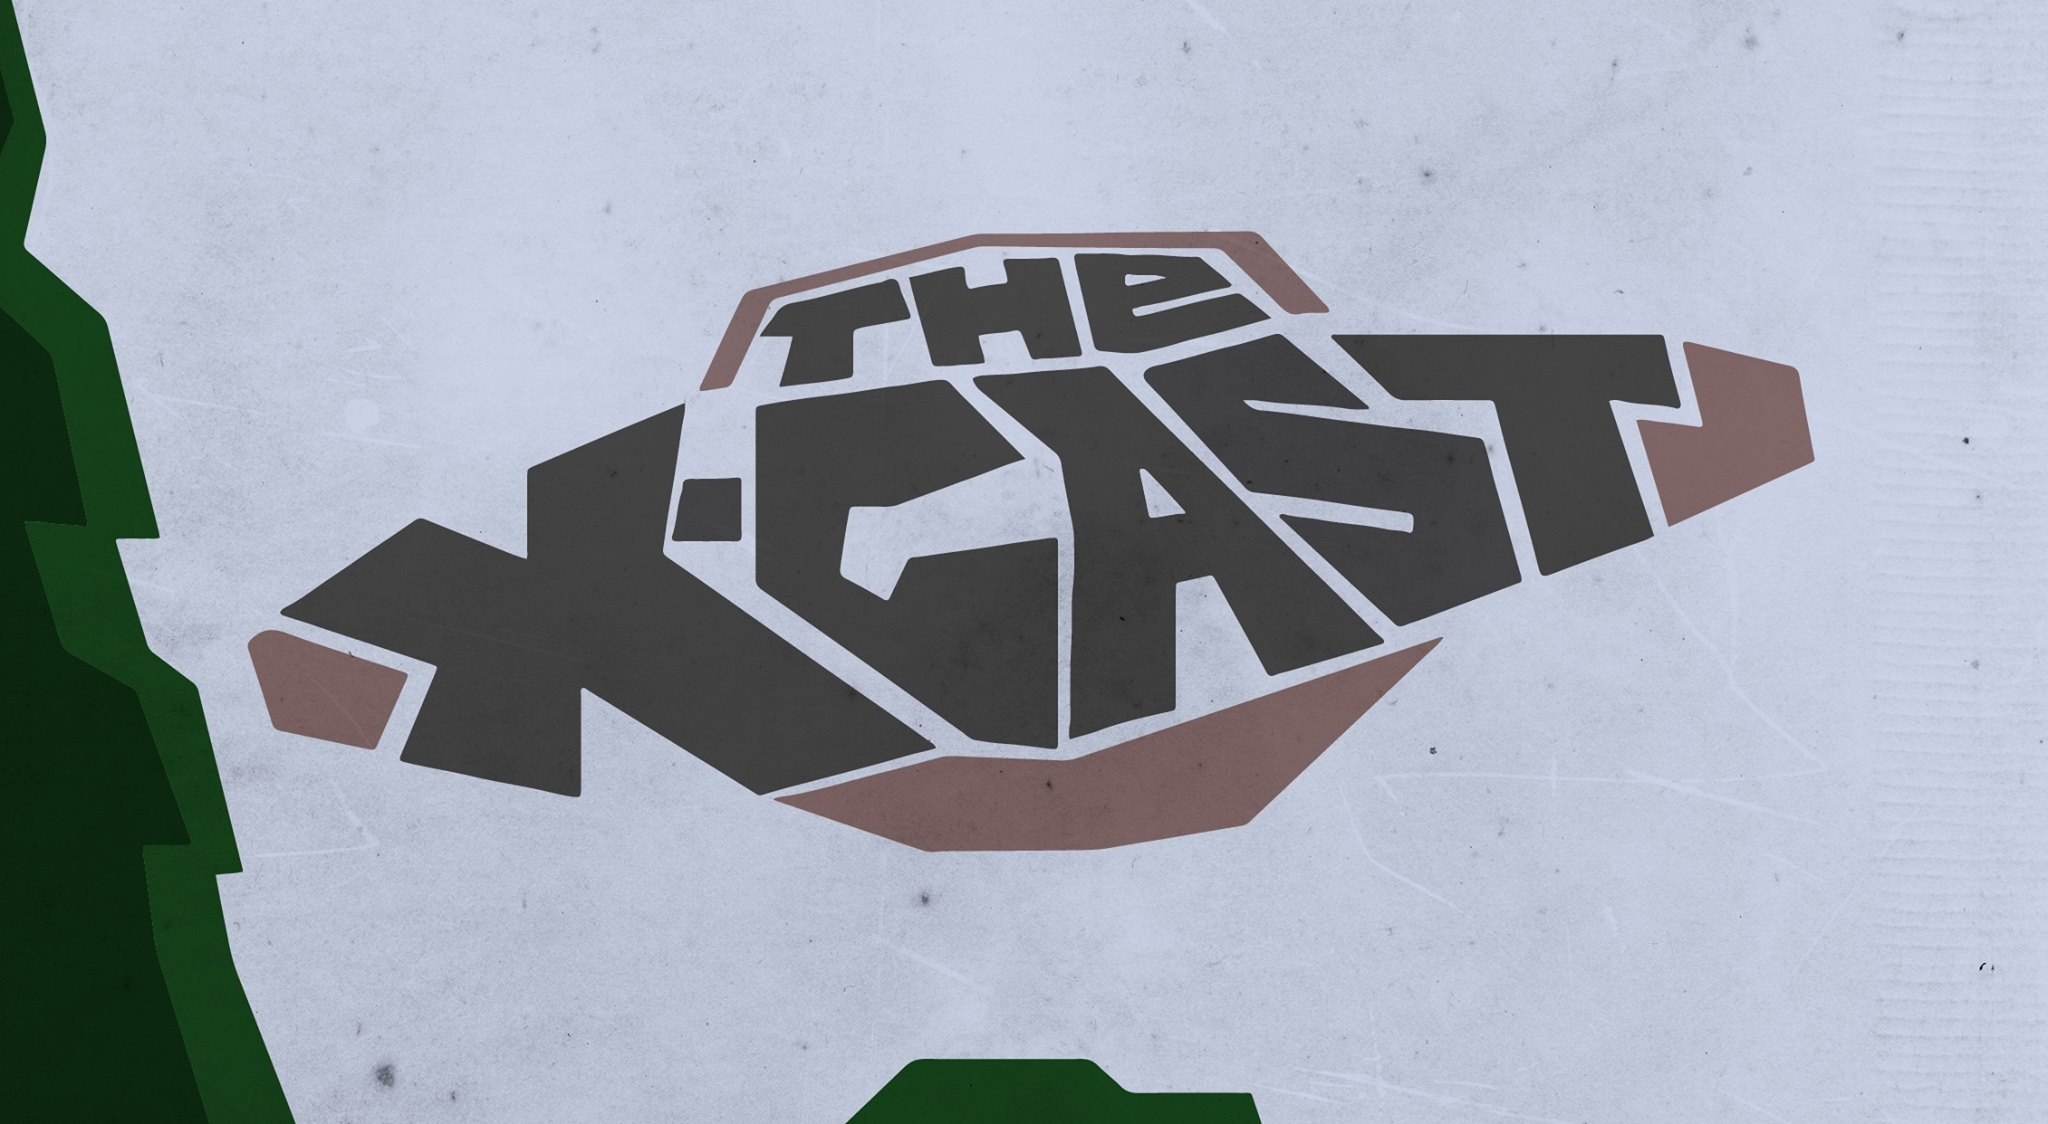 The X-Cast An X-Files Podcast logo